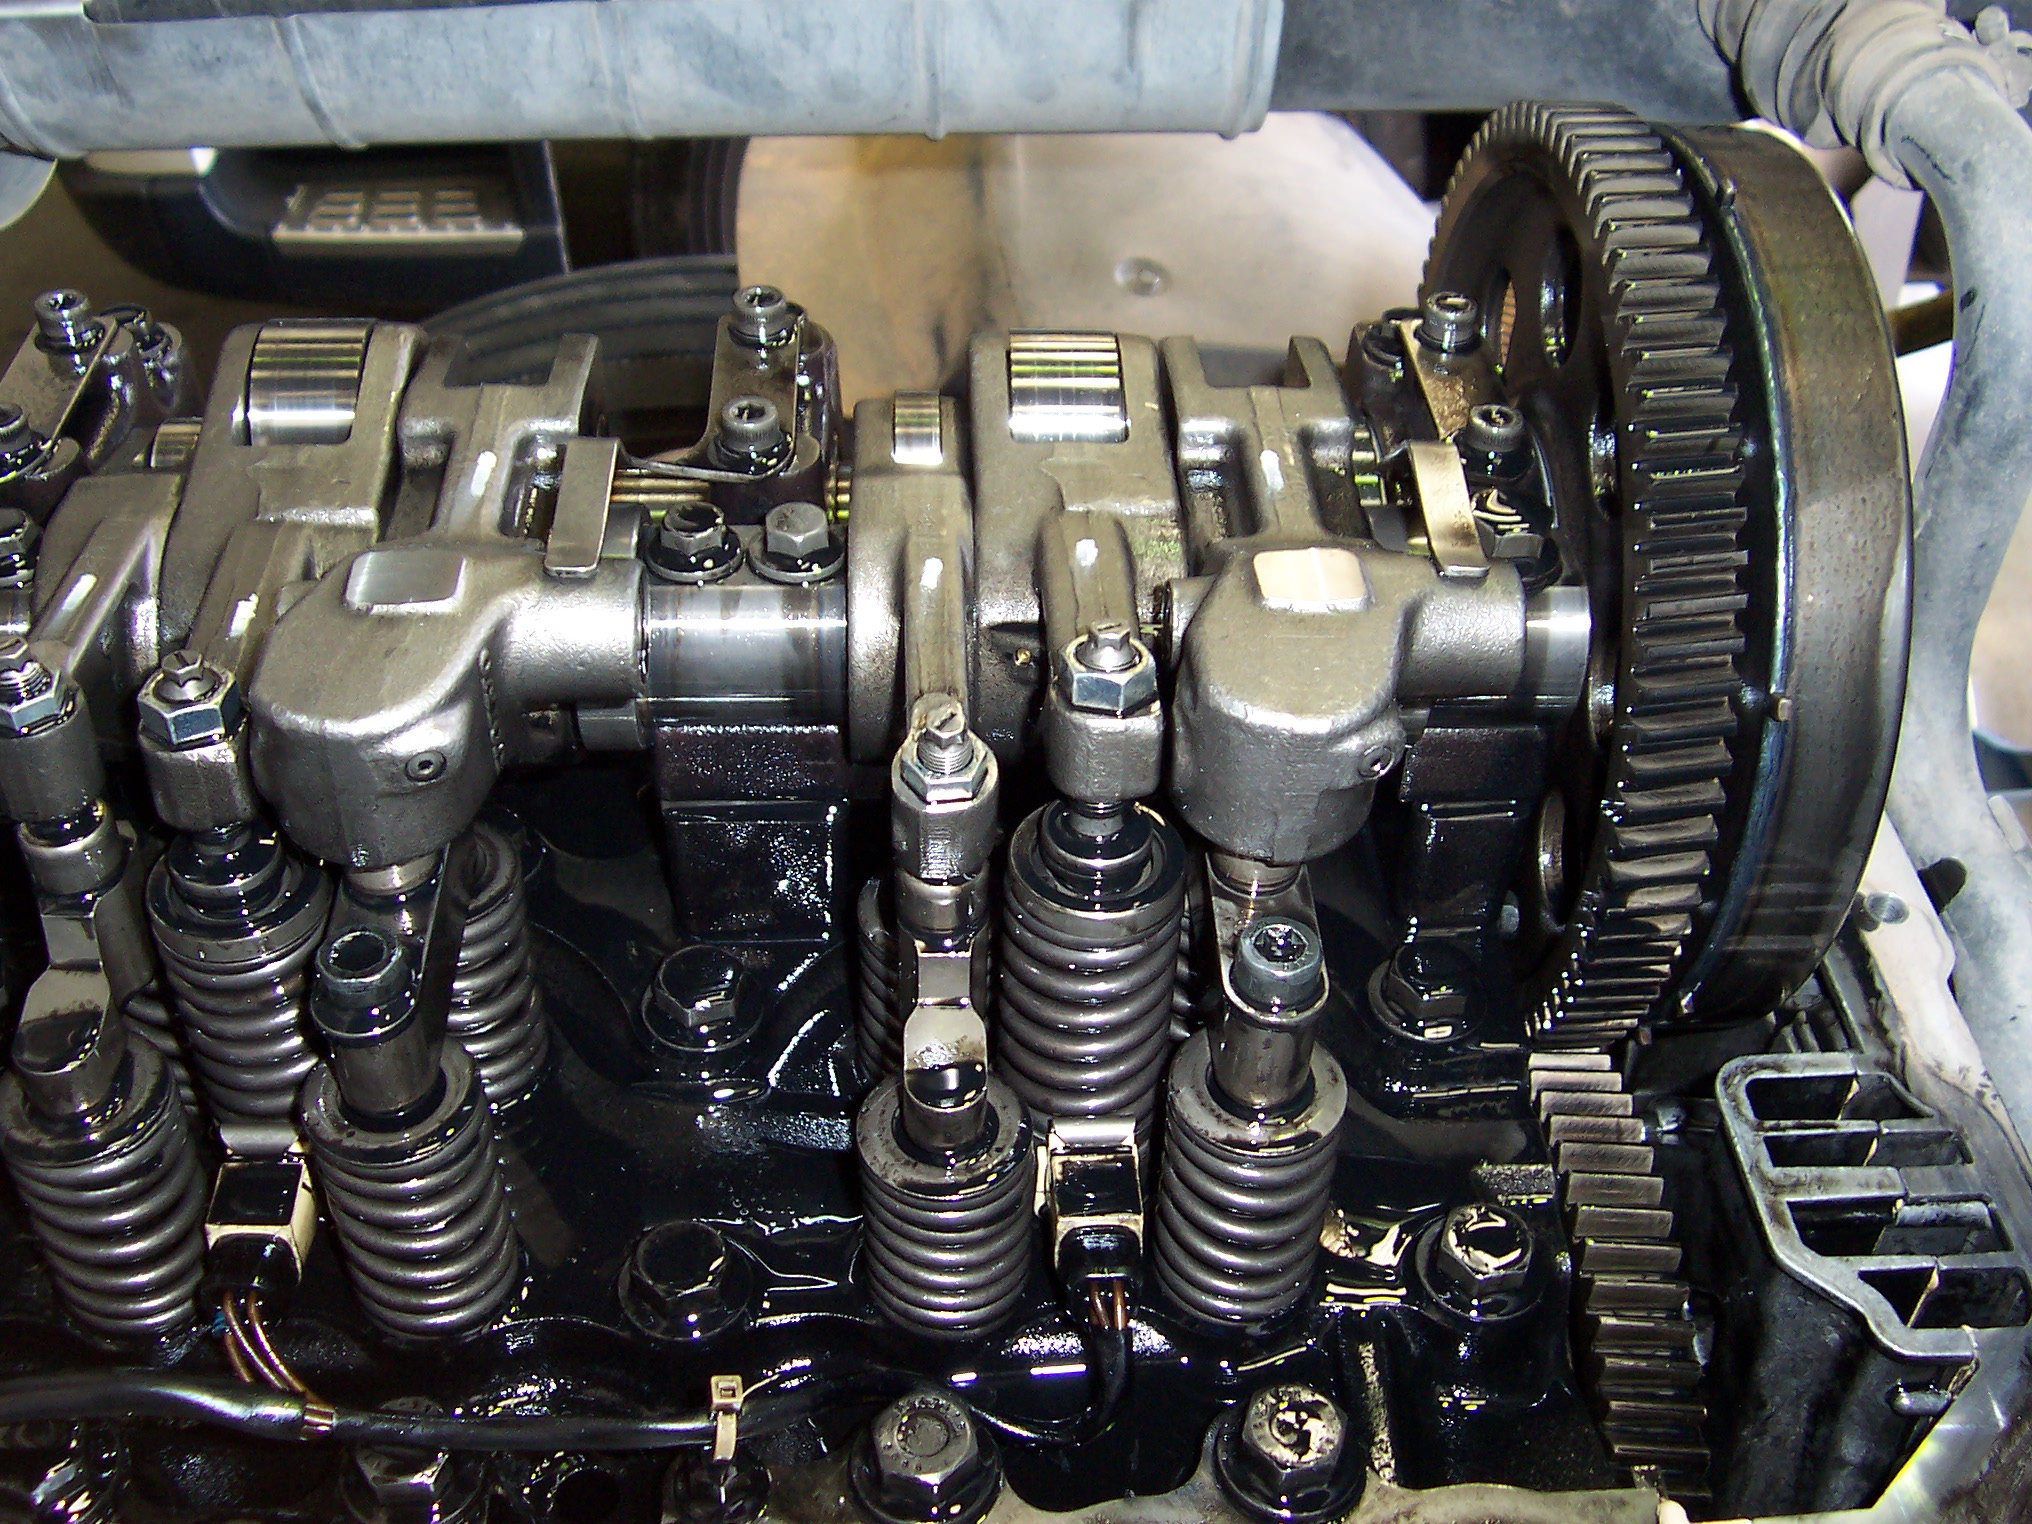 Truck Servicing Shop In Peace River Ab M11 Mechanical Services Cat C12 Wiring Diagram Ltd